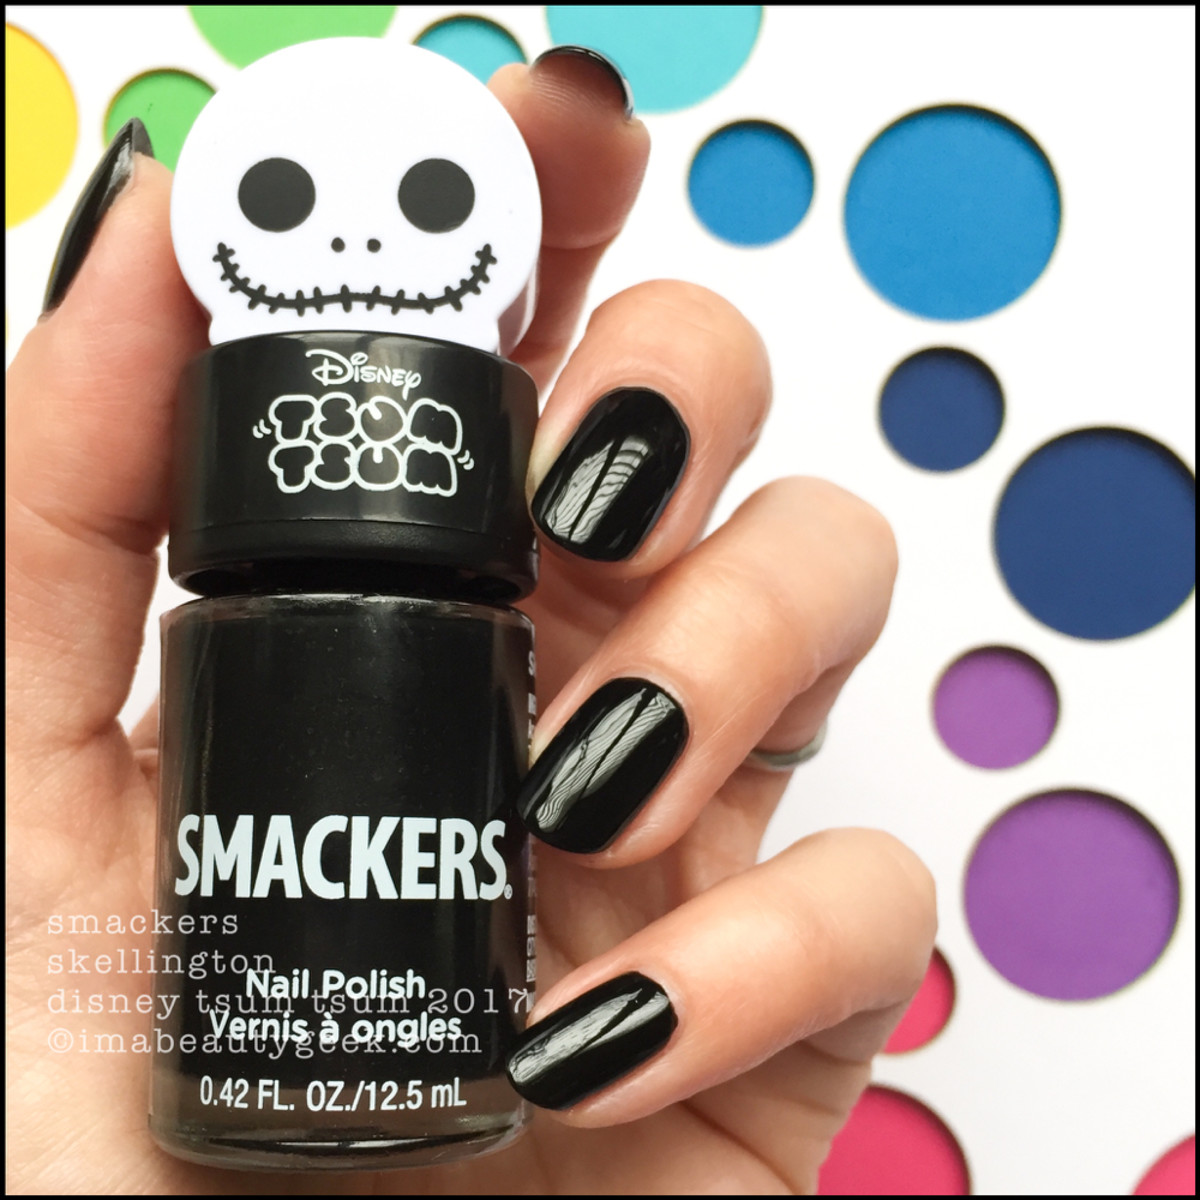 Lip Smackers Tsum Tsum Polish Skellington